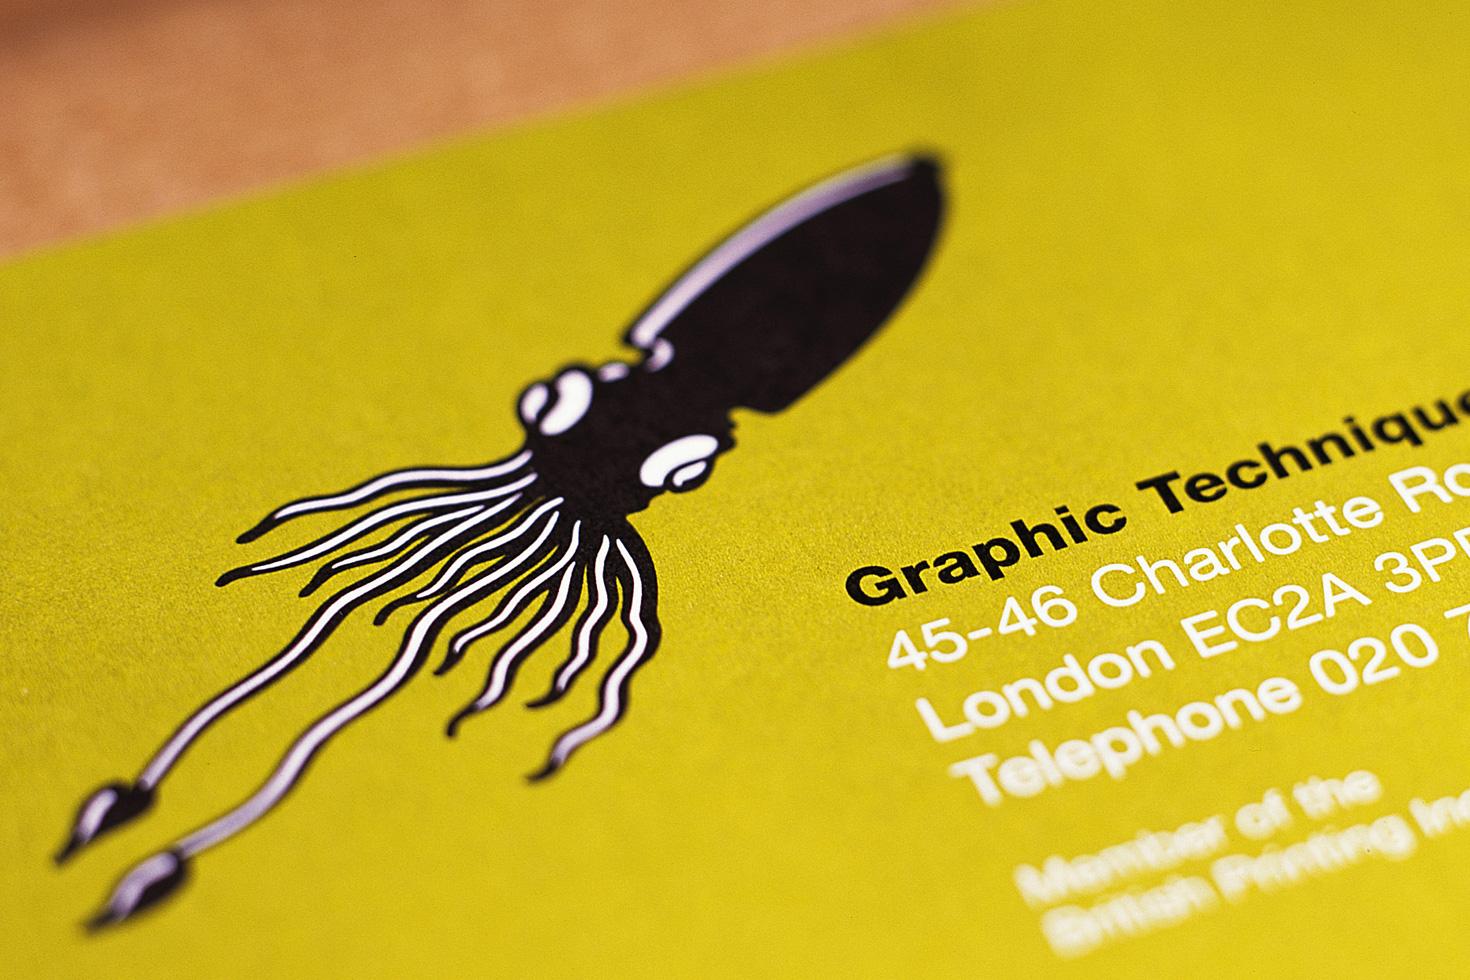 Graphic Techniques business card